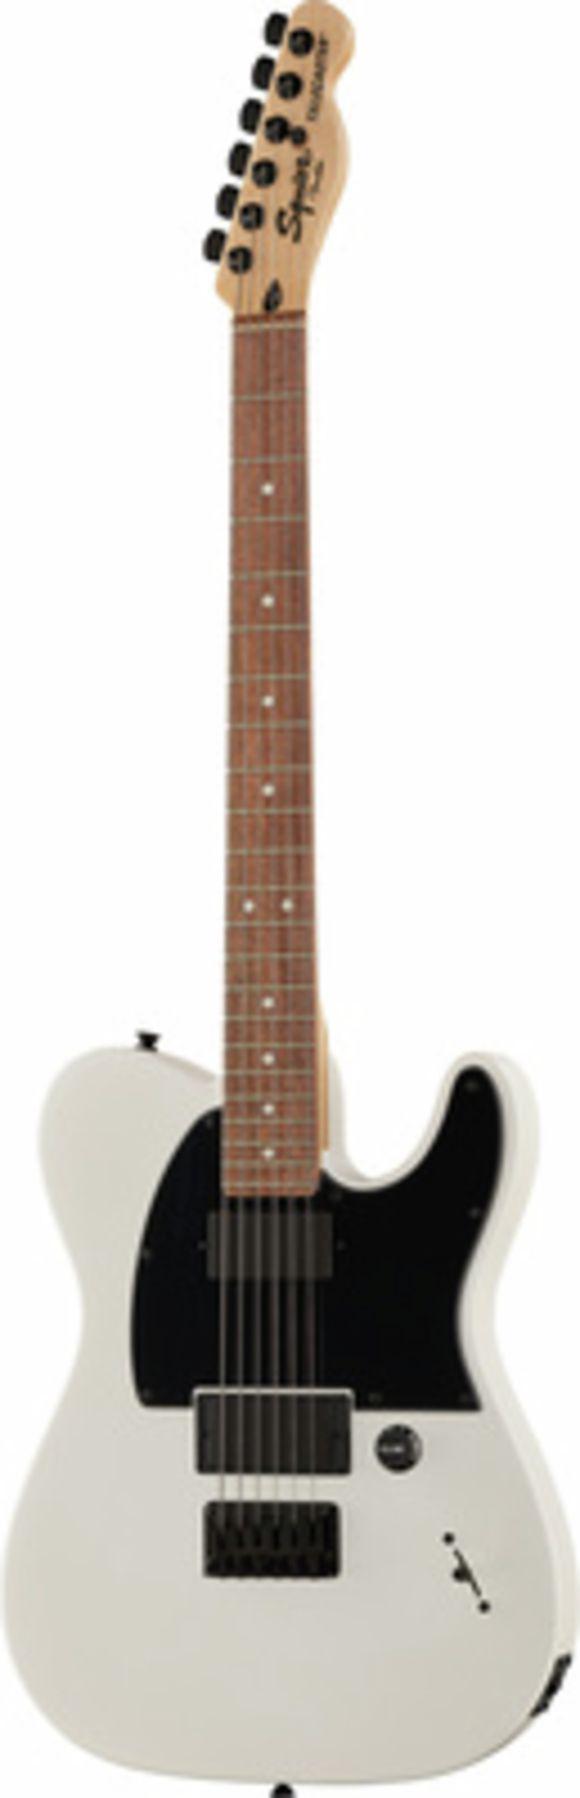 SQ Jim Root Telecaster FW EB Fender